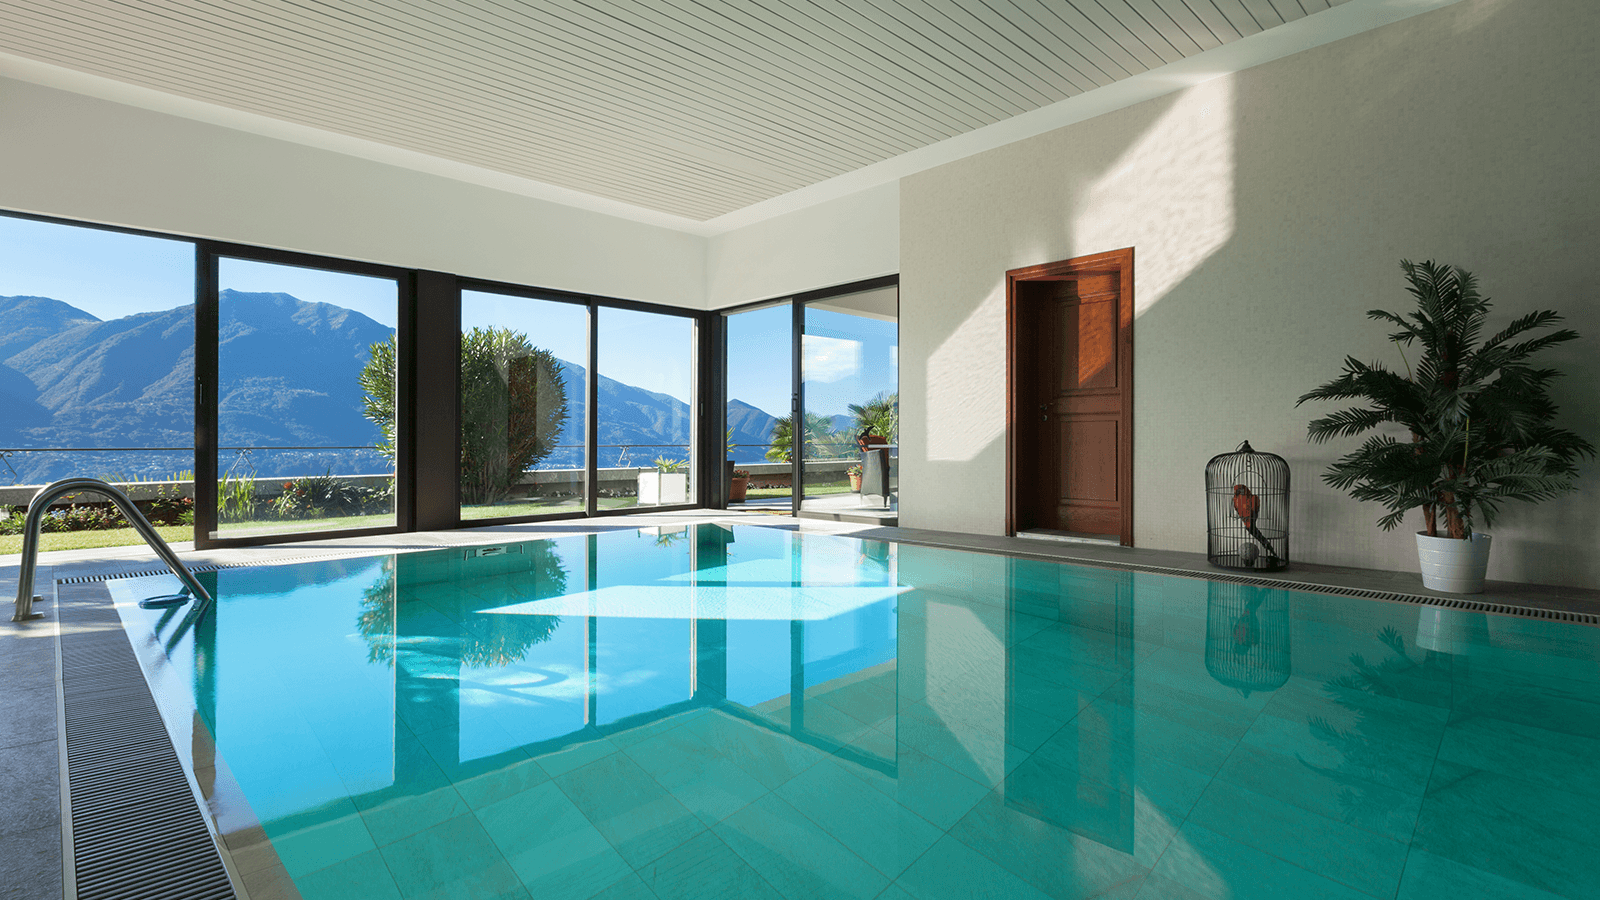 una piscina in una casa